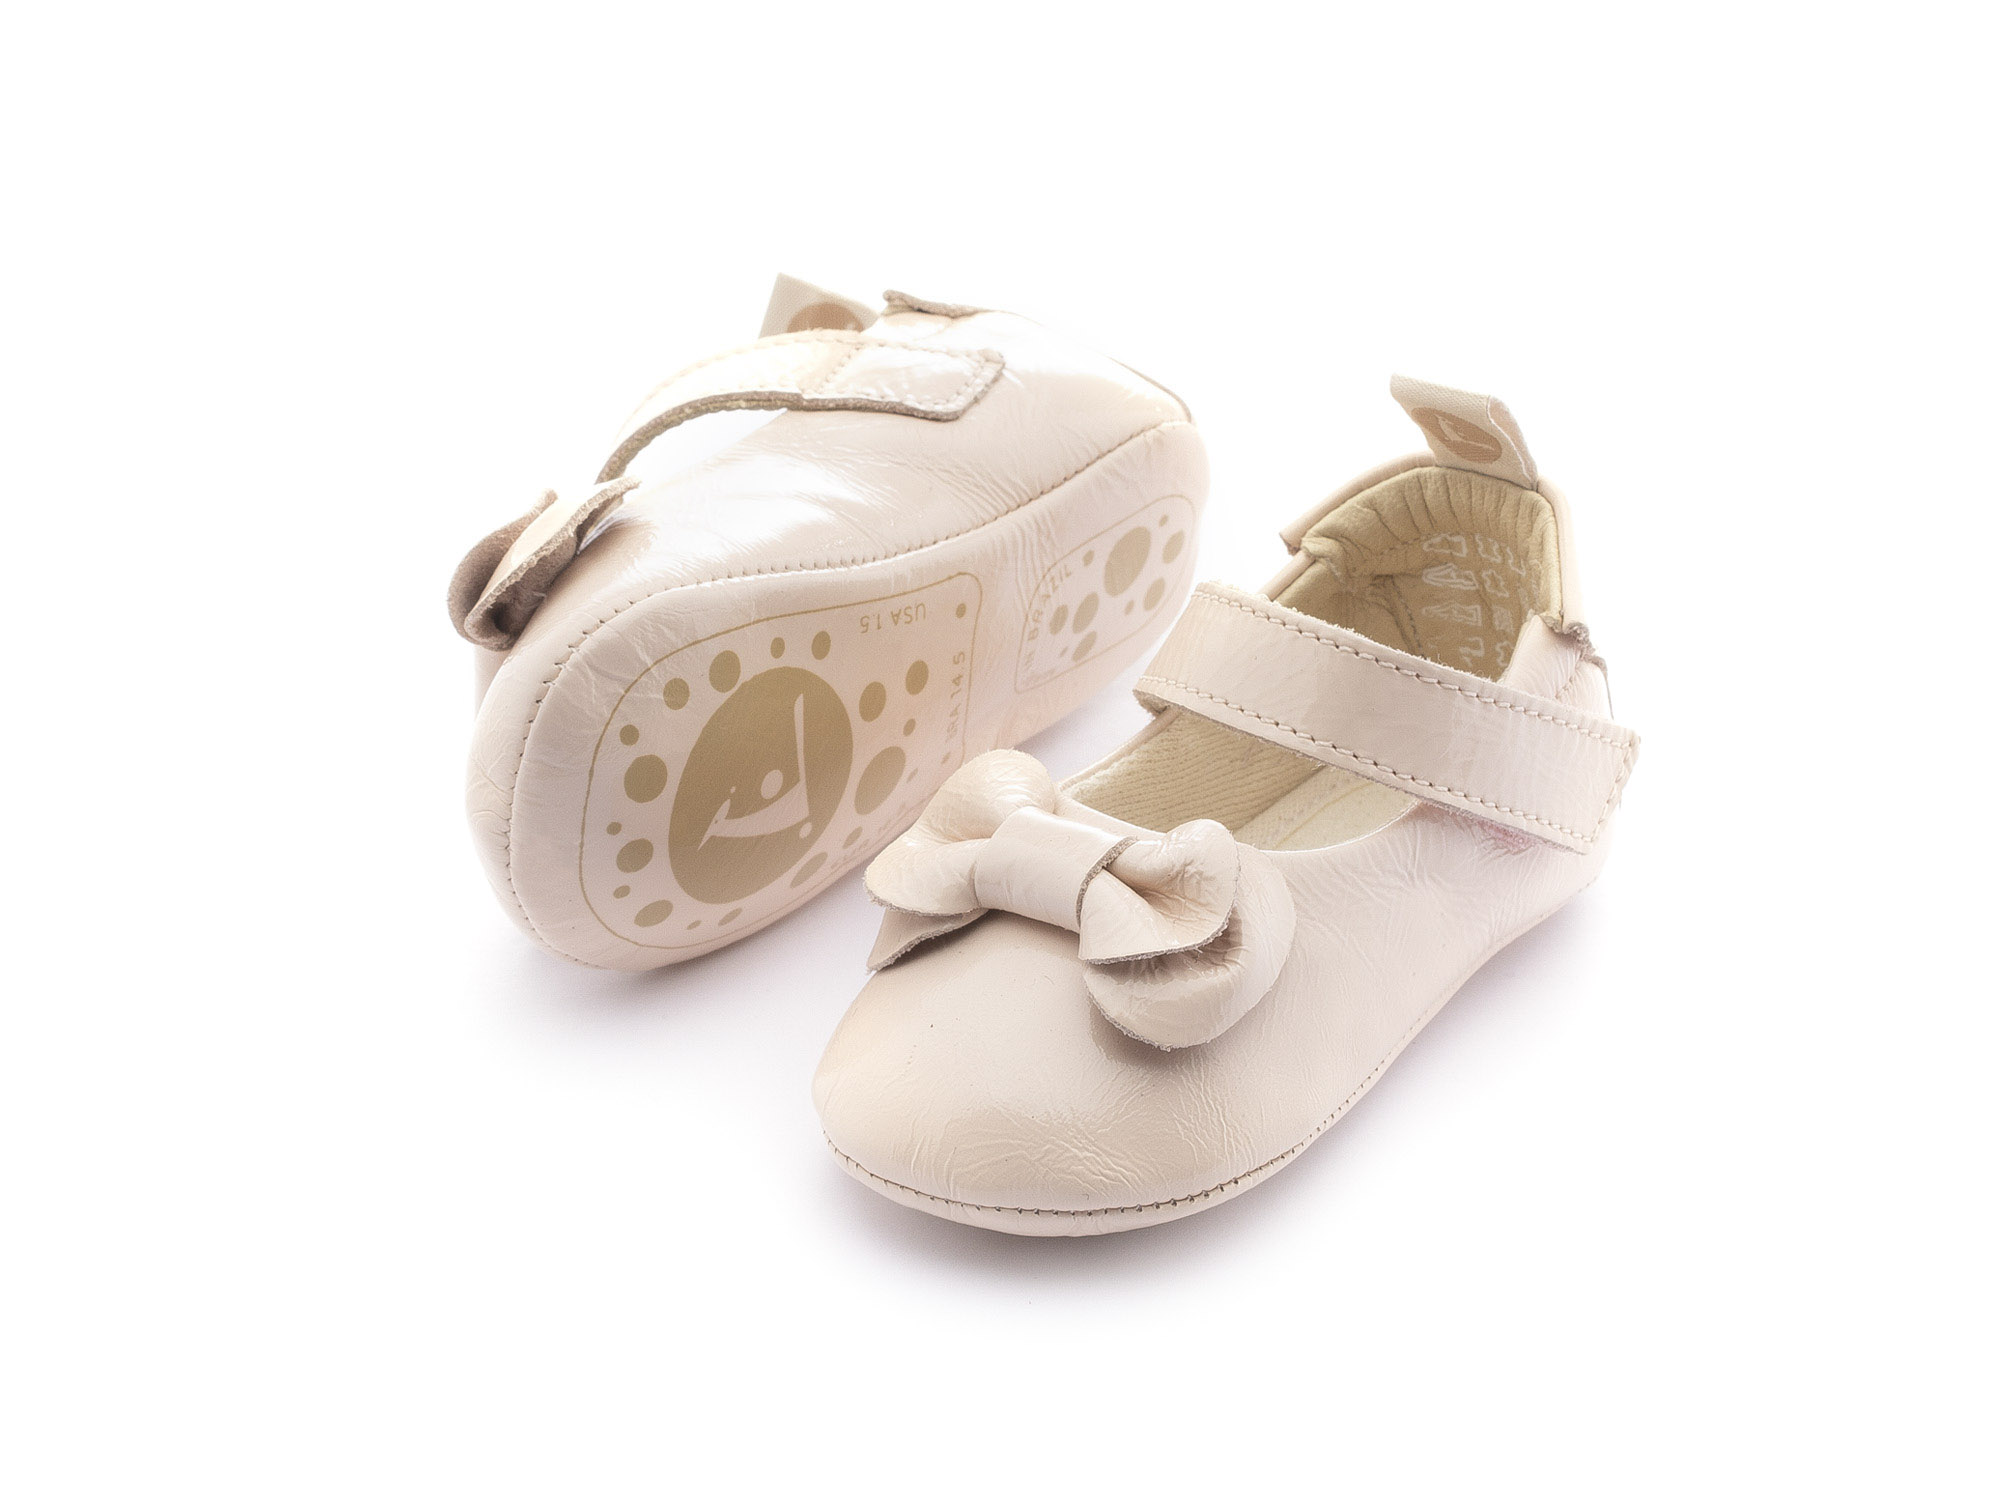 sapatilha Bebê feminino care